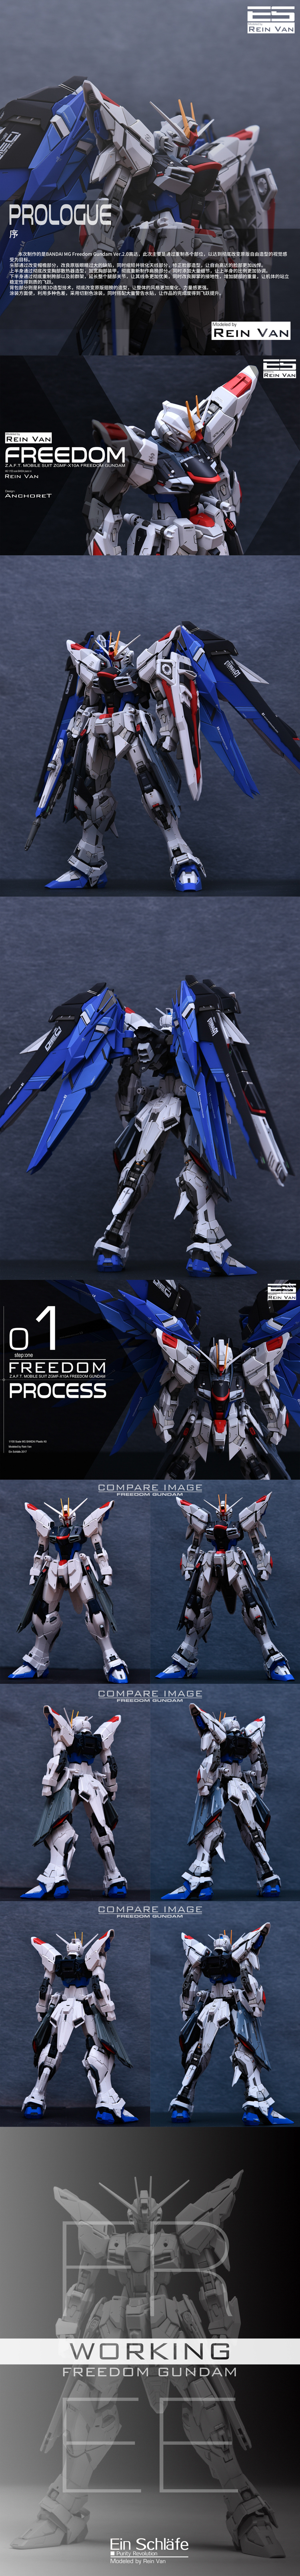 G115_MG_Freedom_inf_GK_INASK_info_018.jpg